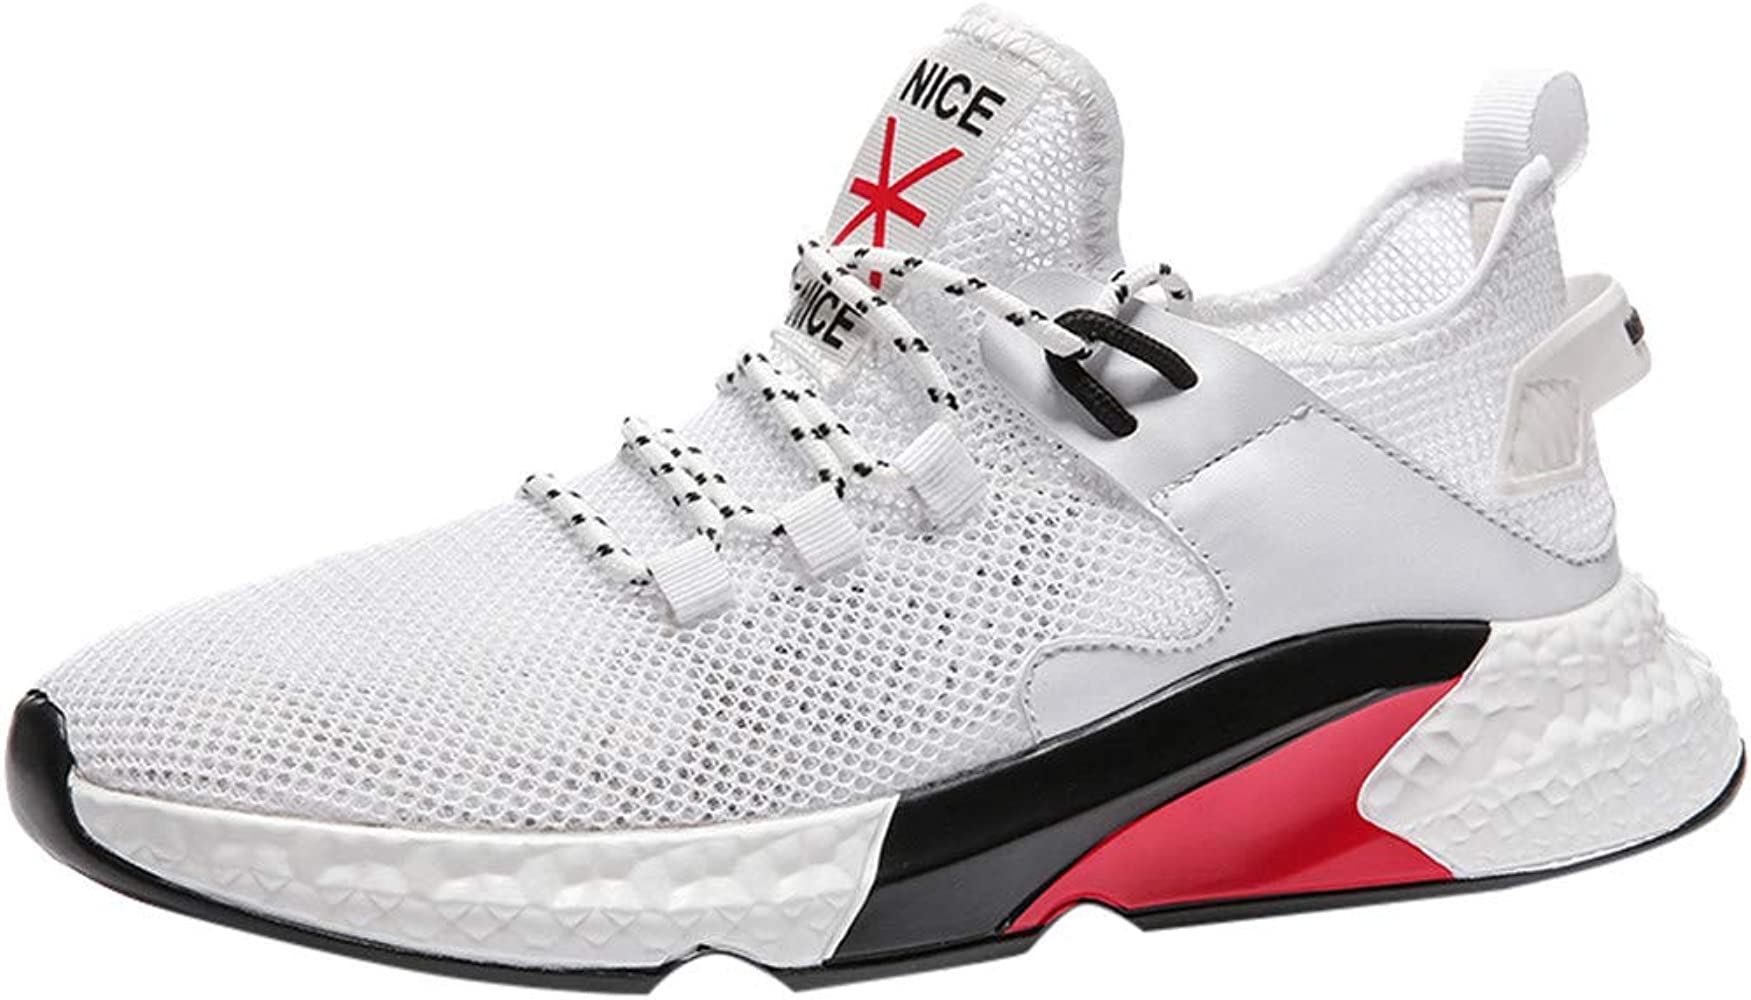 ZARLLE Zapatos para Correr en Asfalto para Hombre,Zapatos de Cordones,Ligeros Transpirables Zapatos de Malla,Zapatillas de Running,Sneakers para Caminar,Zapatos de Tejer para Hombre: Amazon.es: Ropa y accesorios